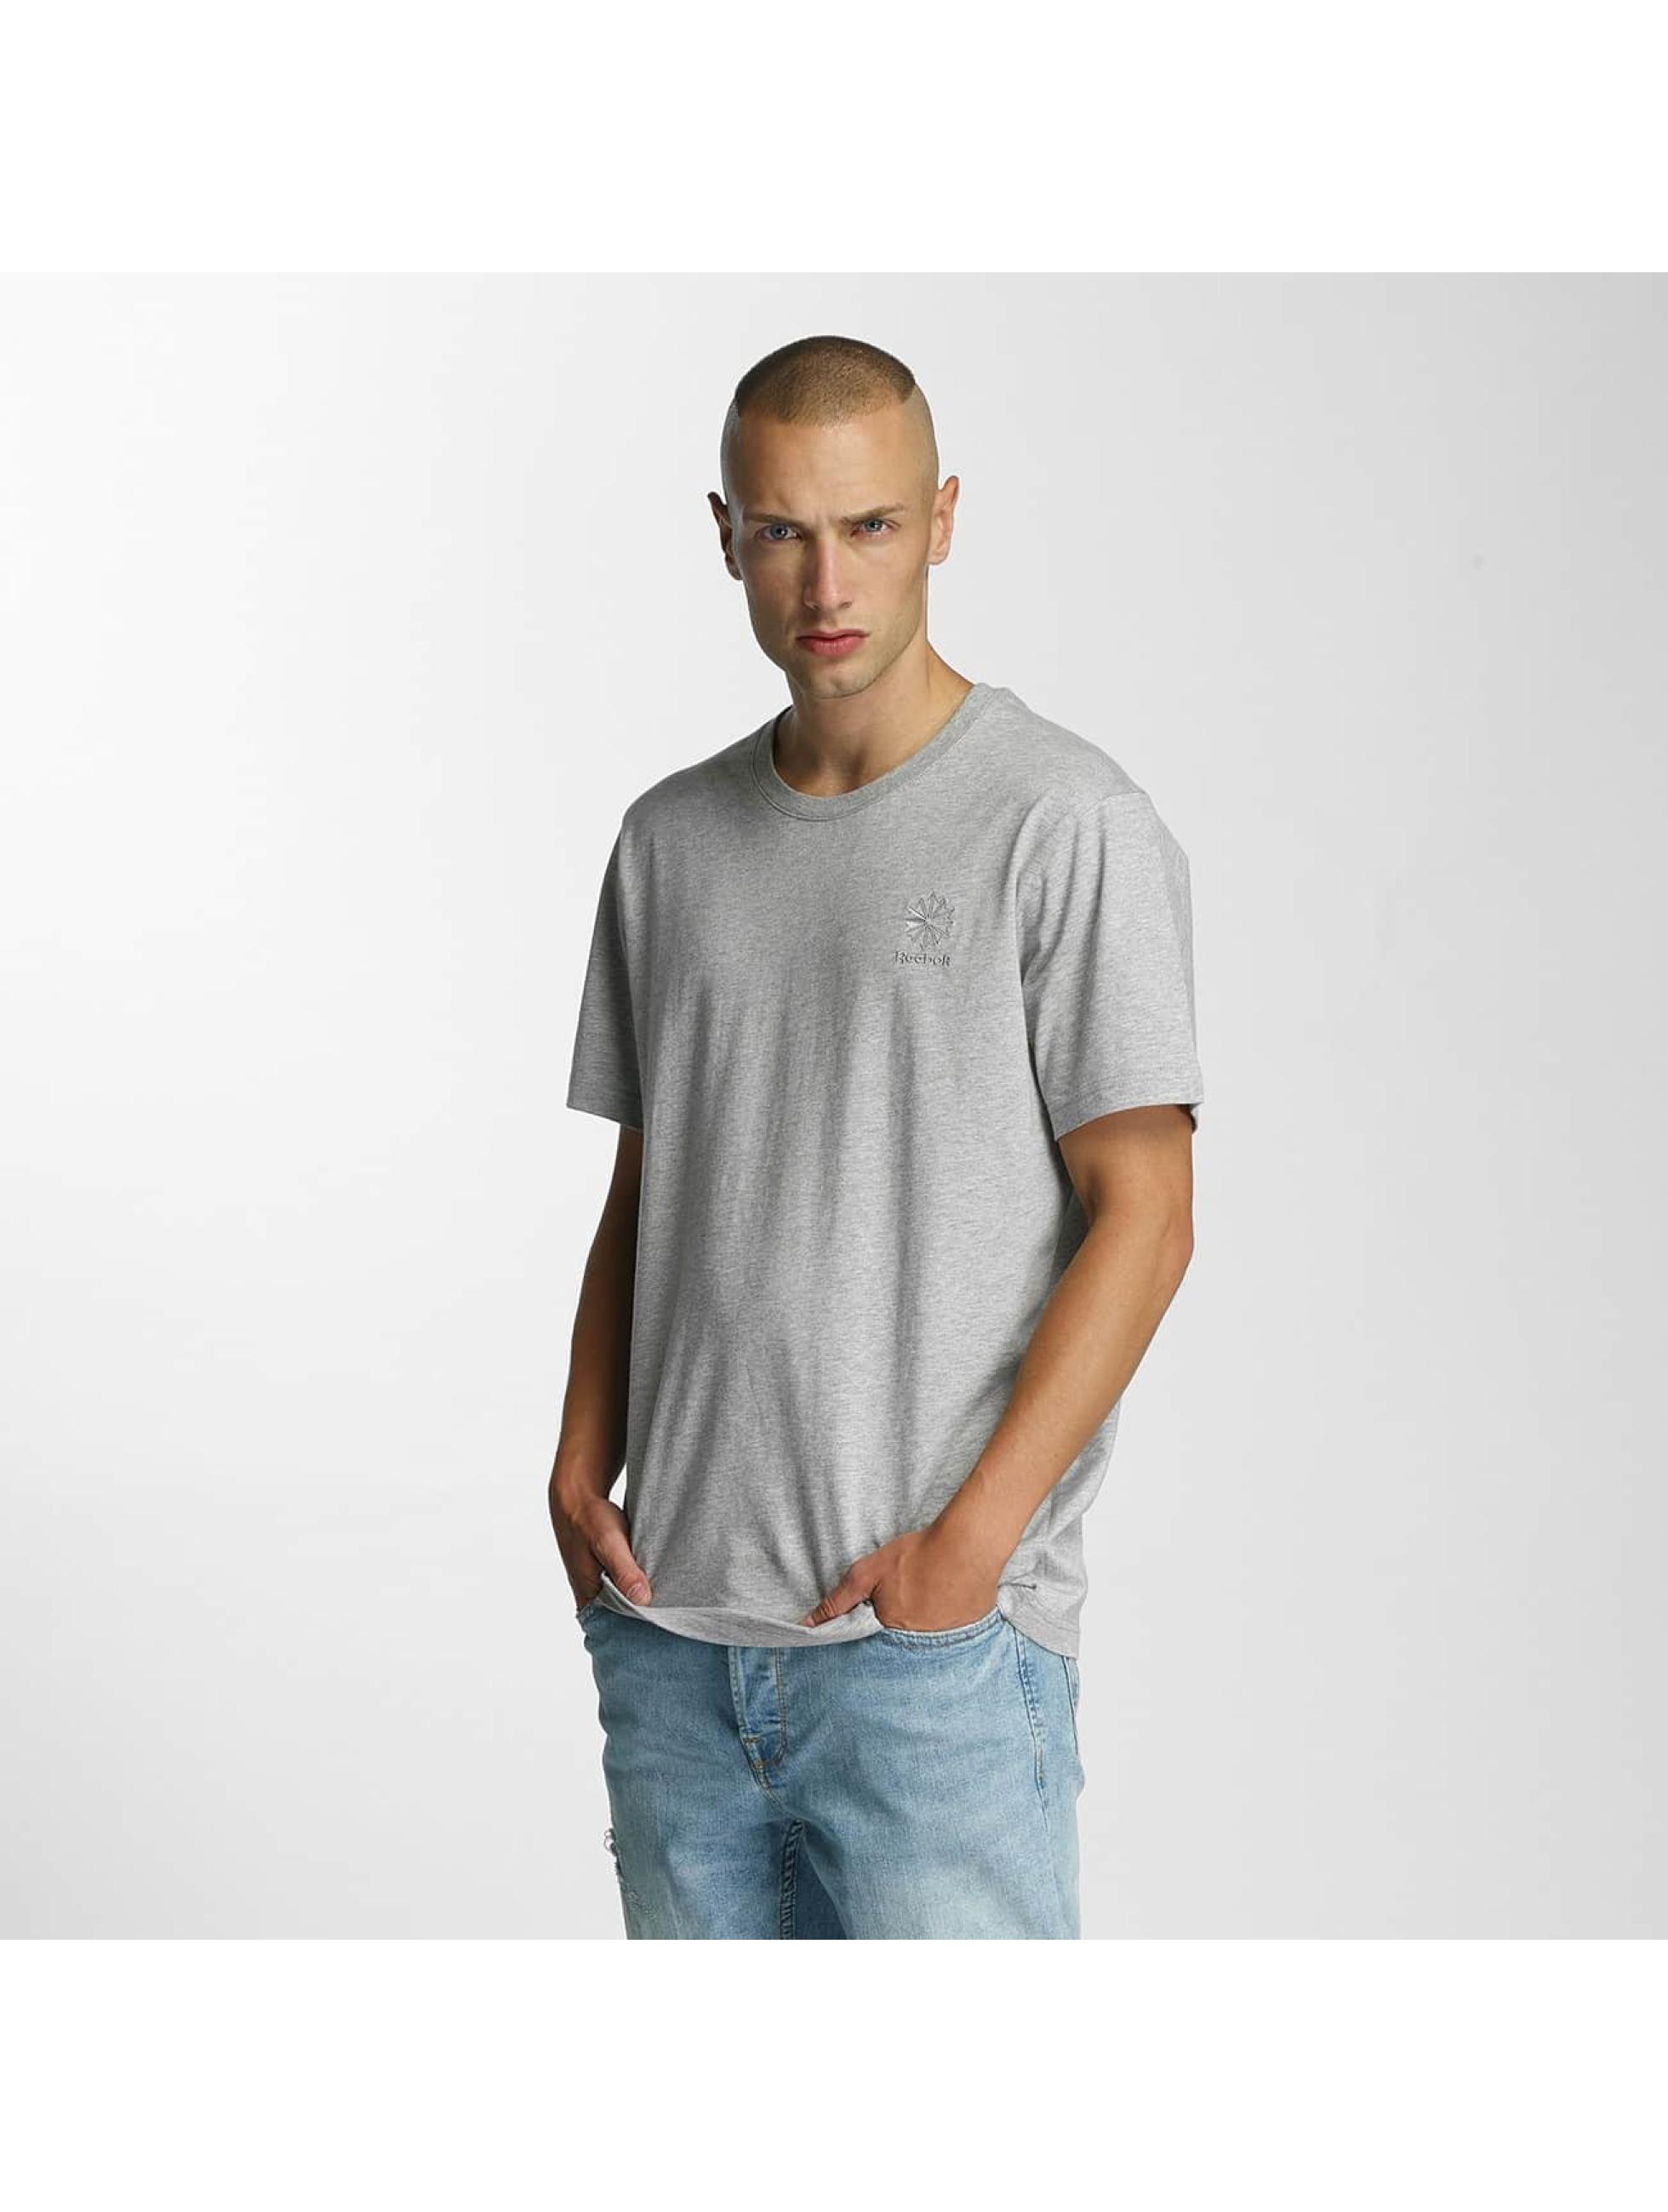 Reebok Männer T-Shirt F Franchise Star in grau